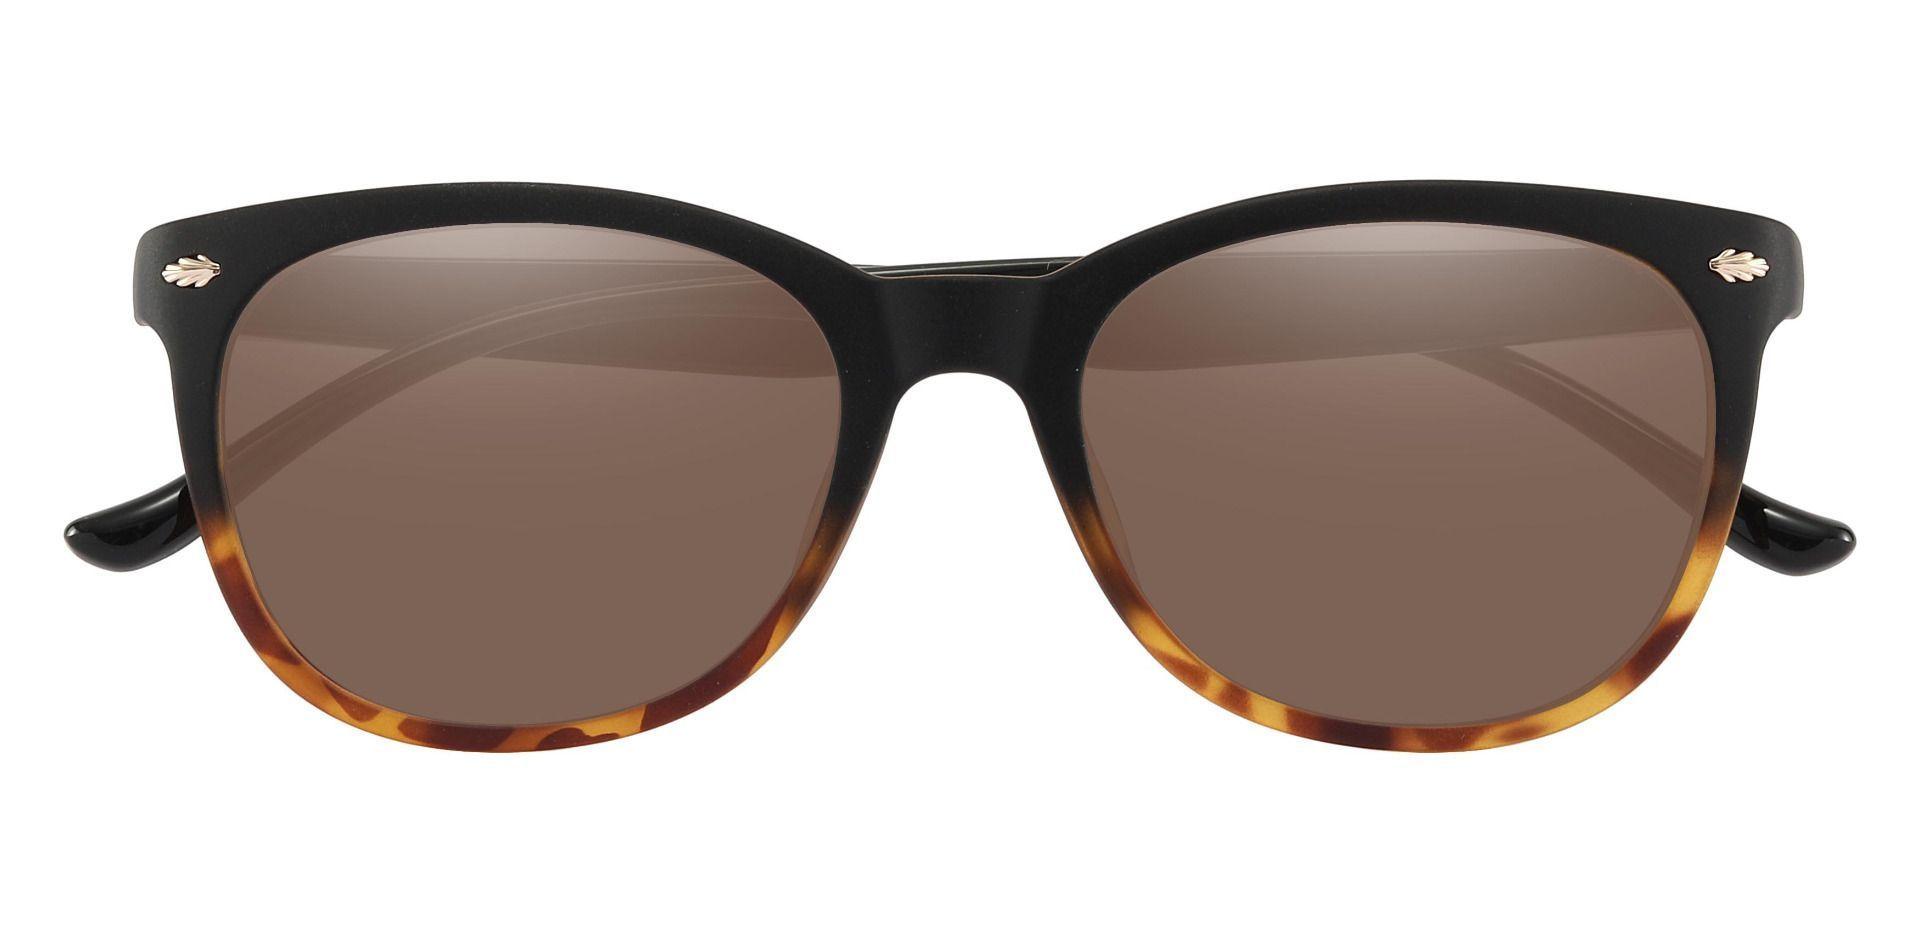 Pavilion Square Prescription Sunglasses - Black Frame With Brown Lenses